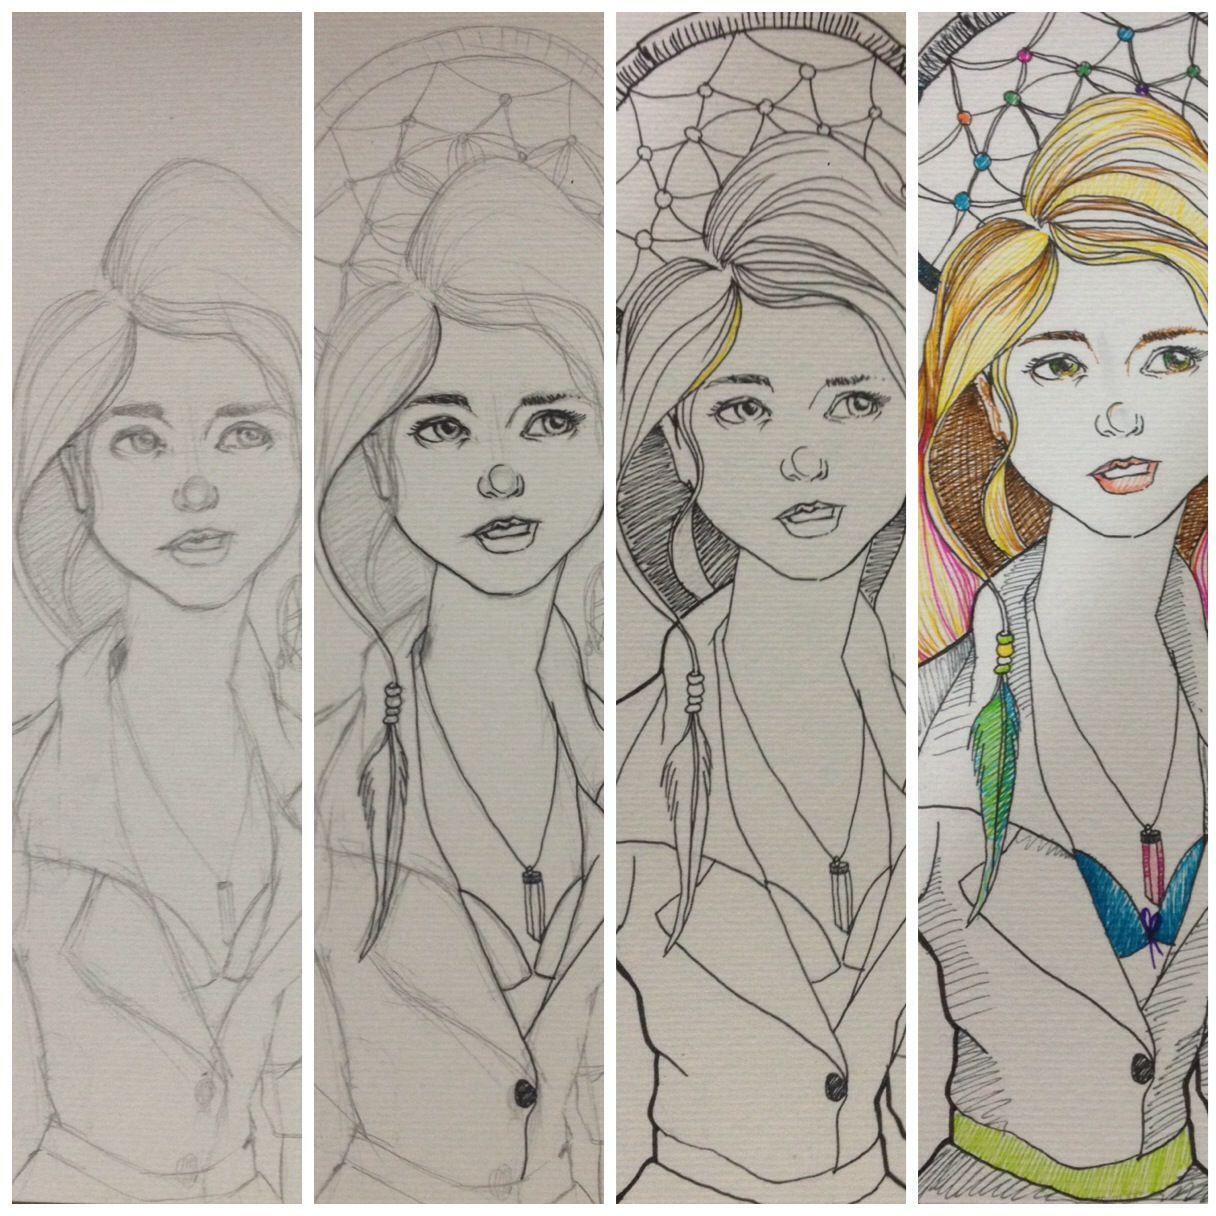 #Dreamcatcher For Elise, Comic, illustration